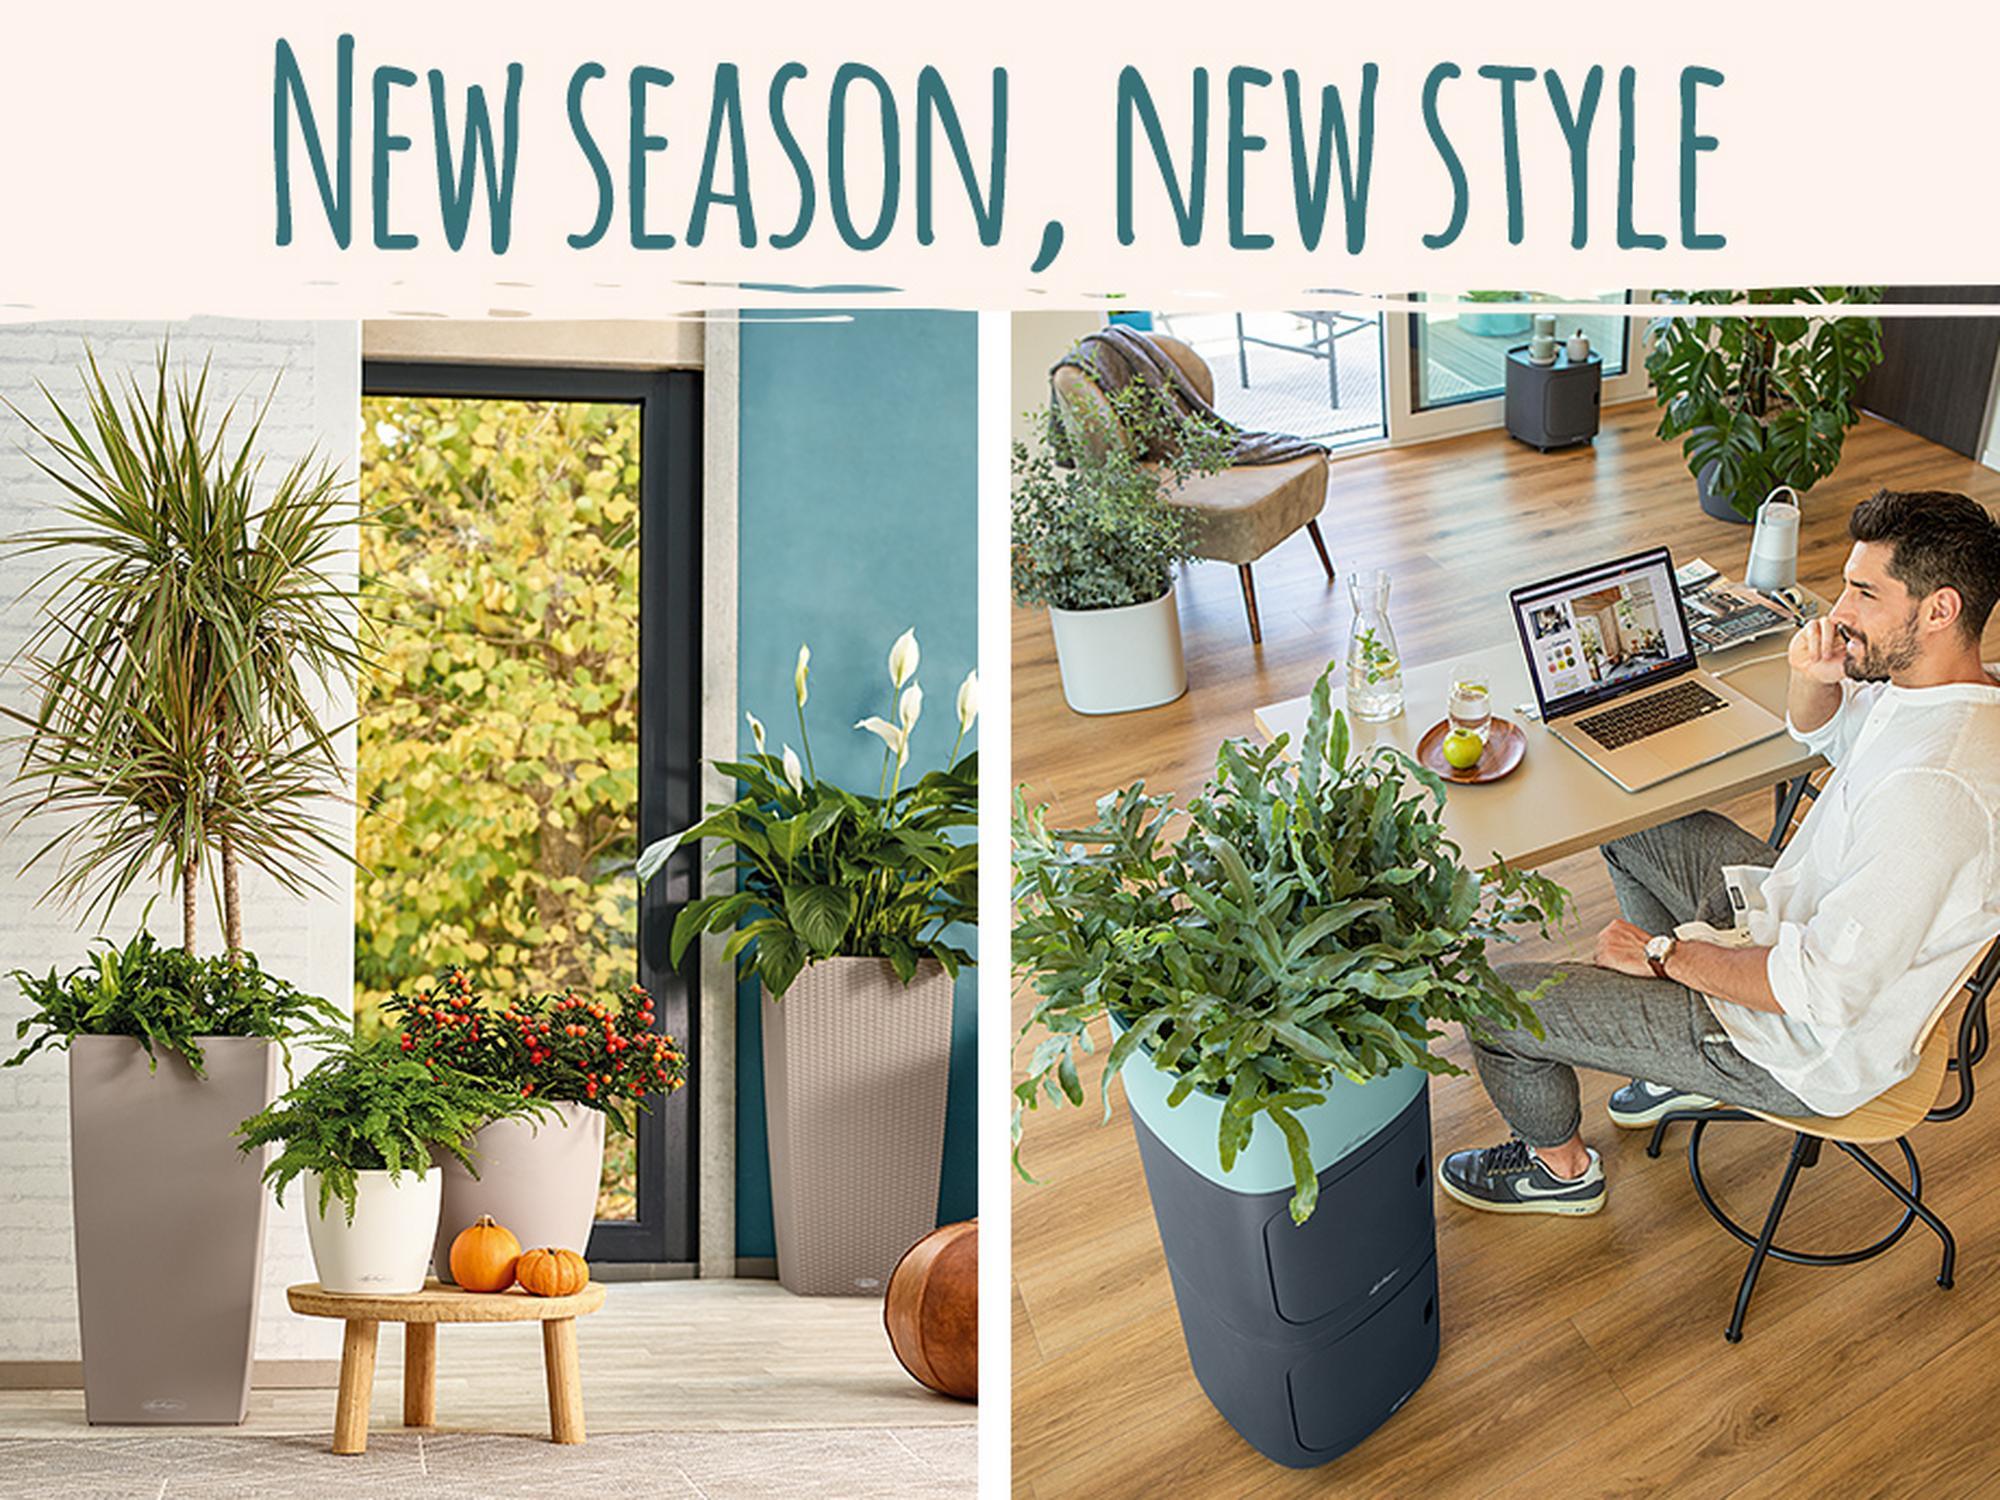 'New season